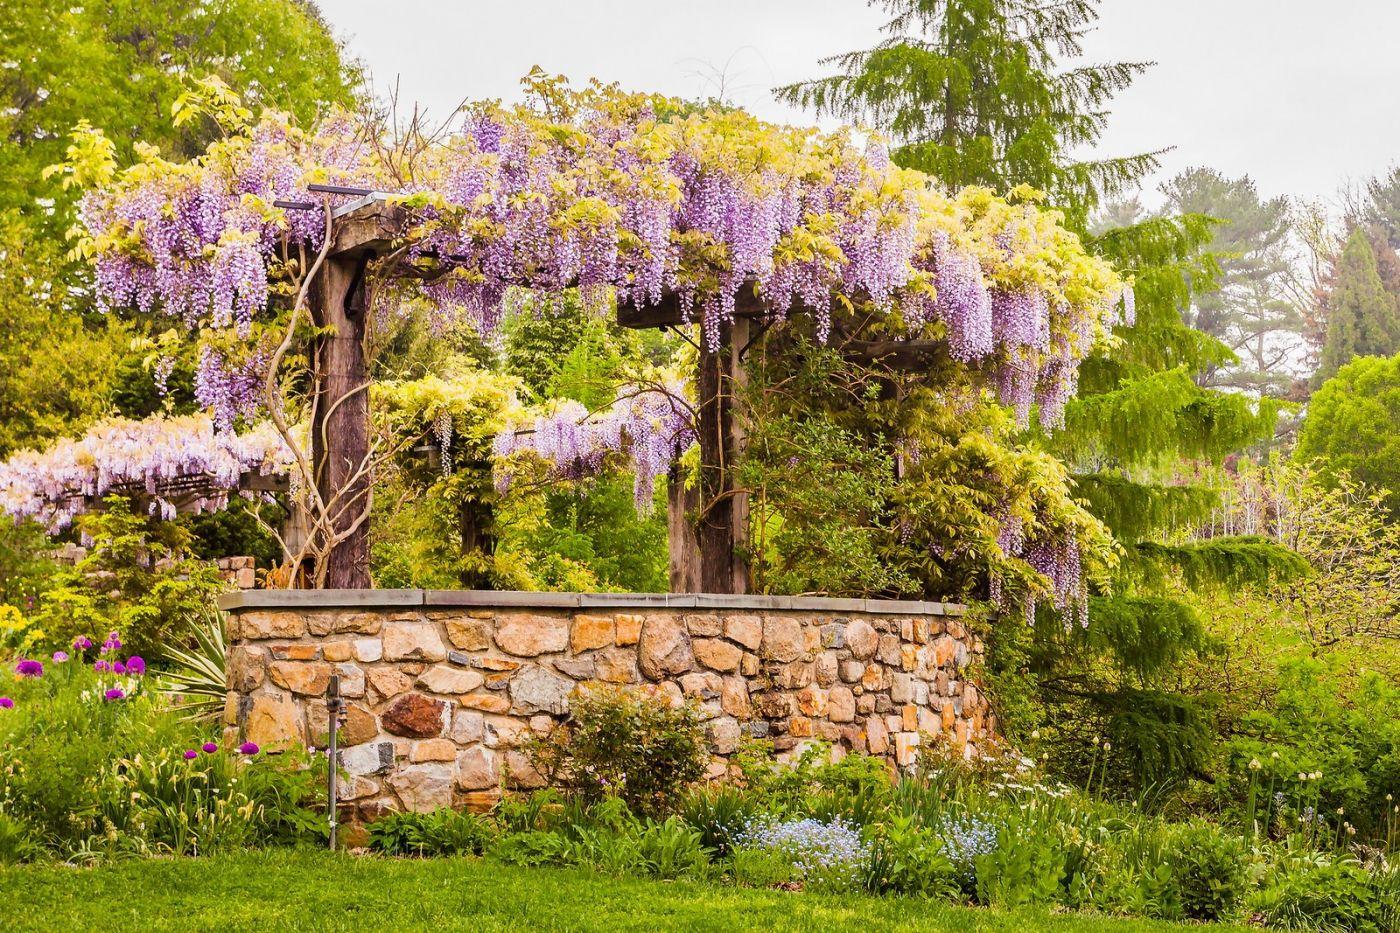 Chanticleer花园,那年盛开的紫藤花_图1-4